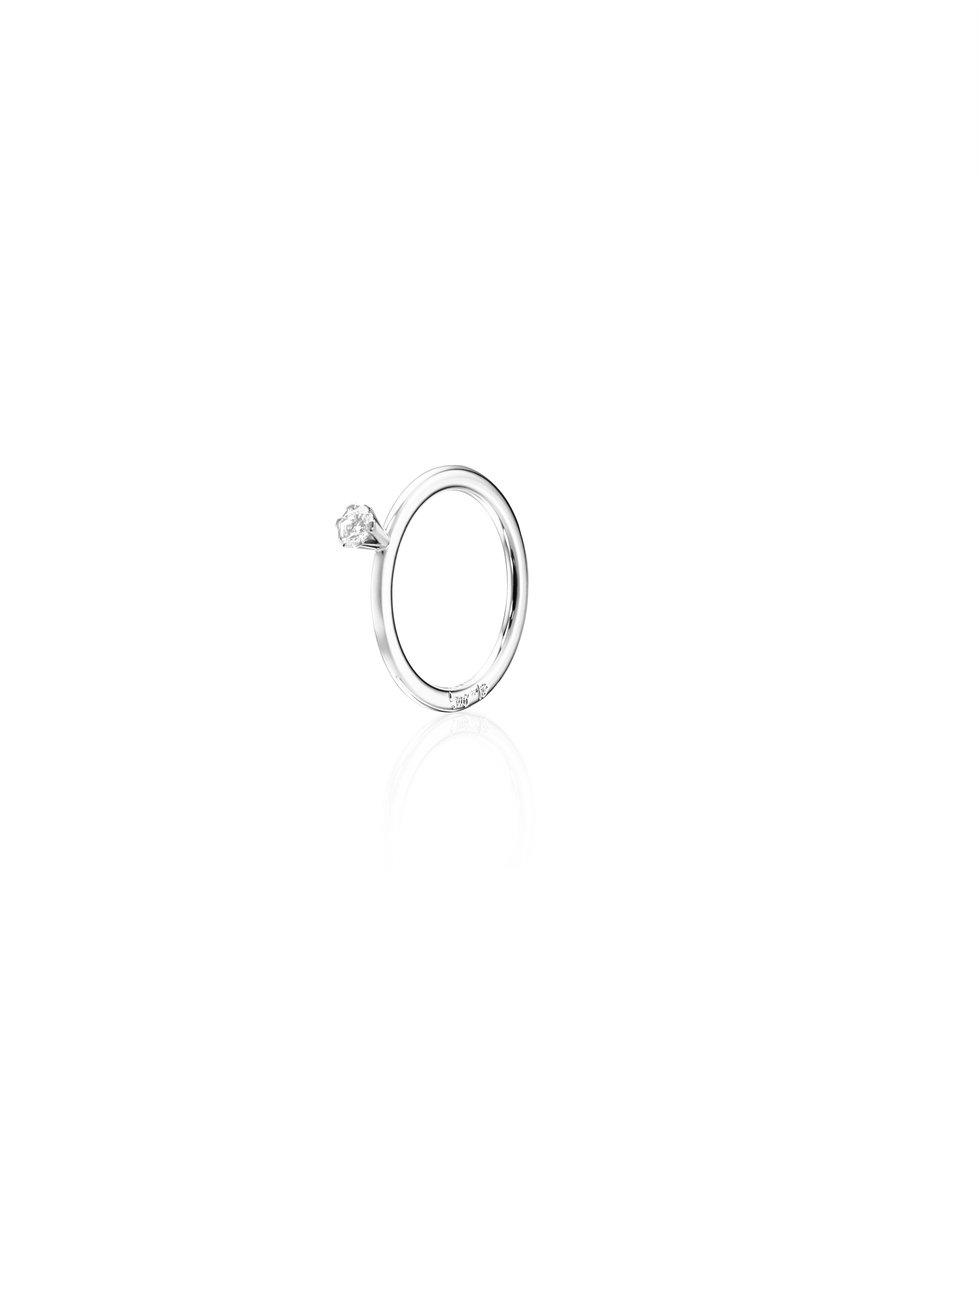 : - High On Love Ring 0.19 ct Vitguld